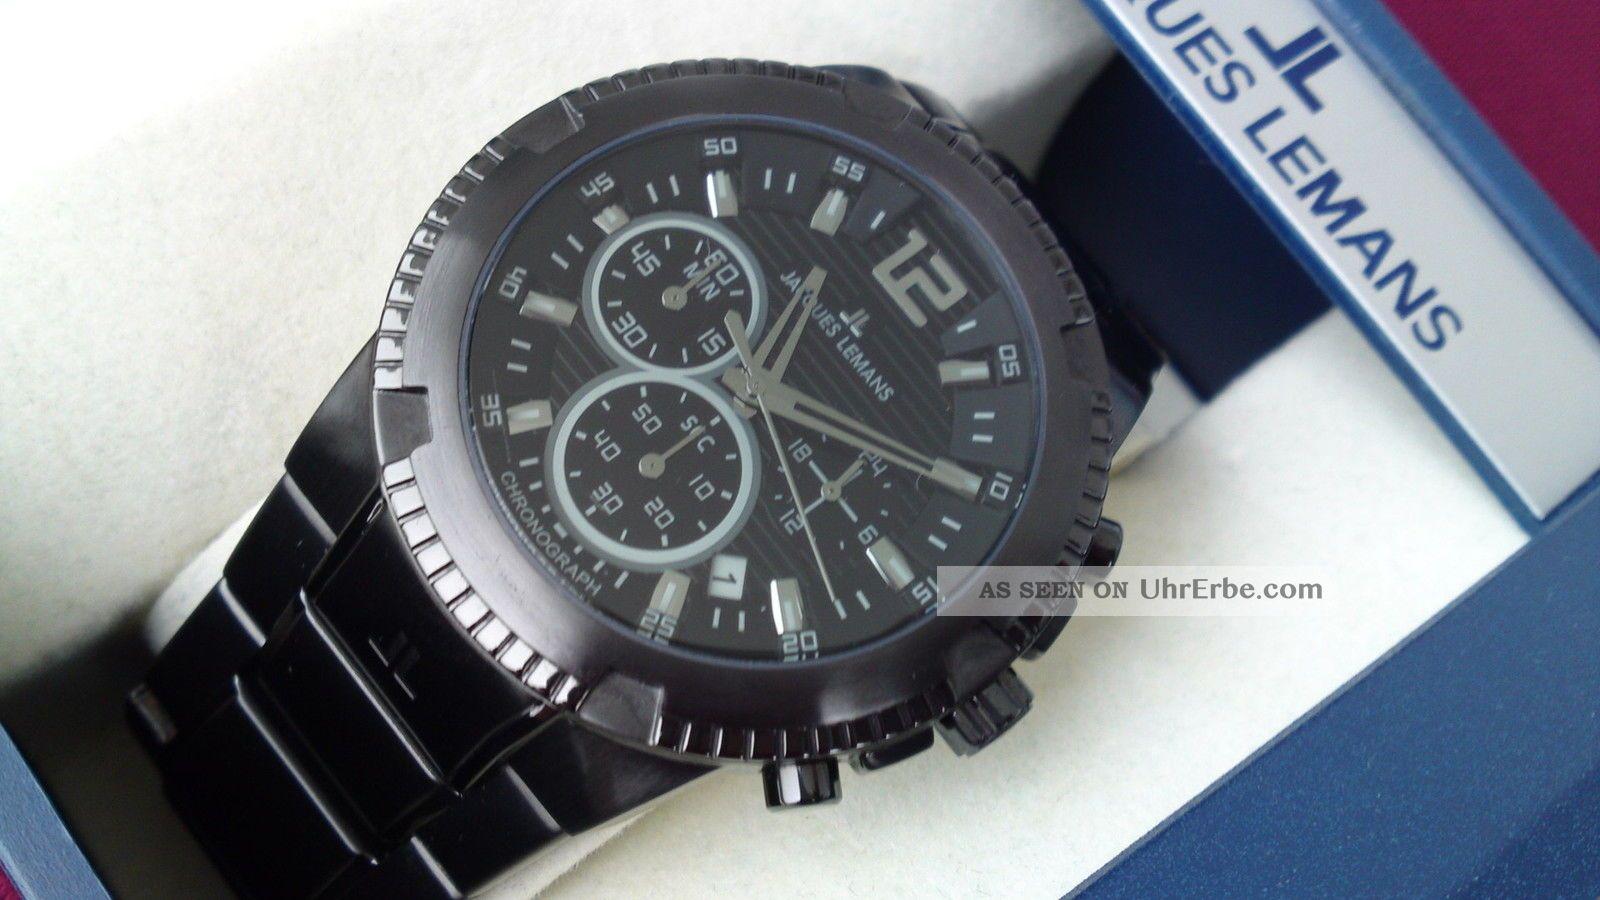 Jacques Lemans Powerchrono Sondermodell 1 - 1455n Uvp 219€ Mit Top Armbanduhren Bild